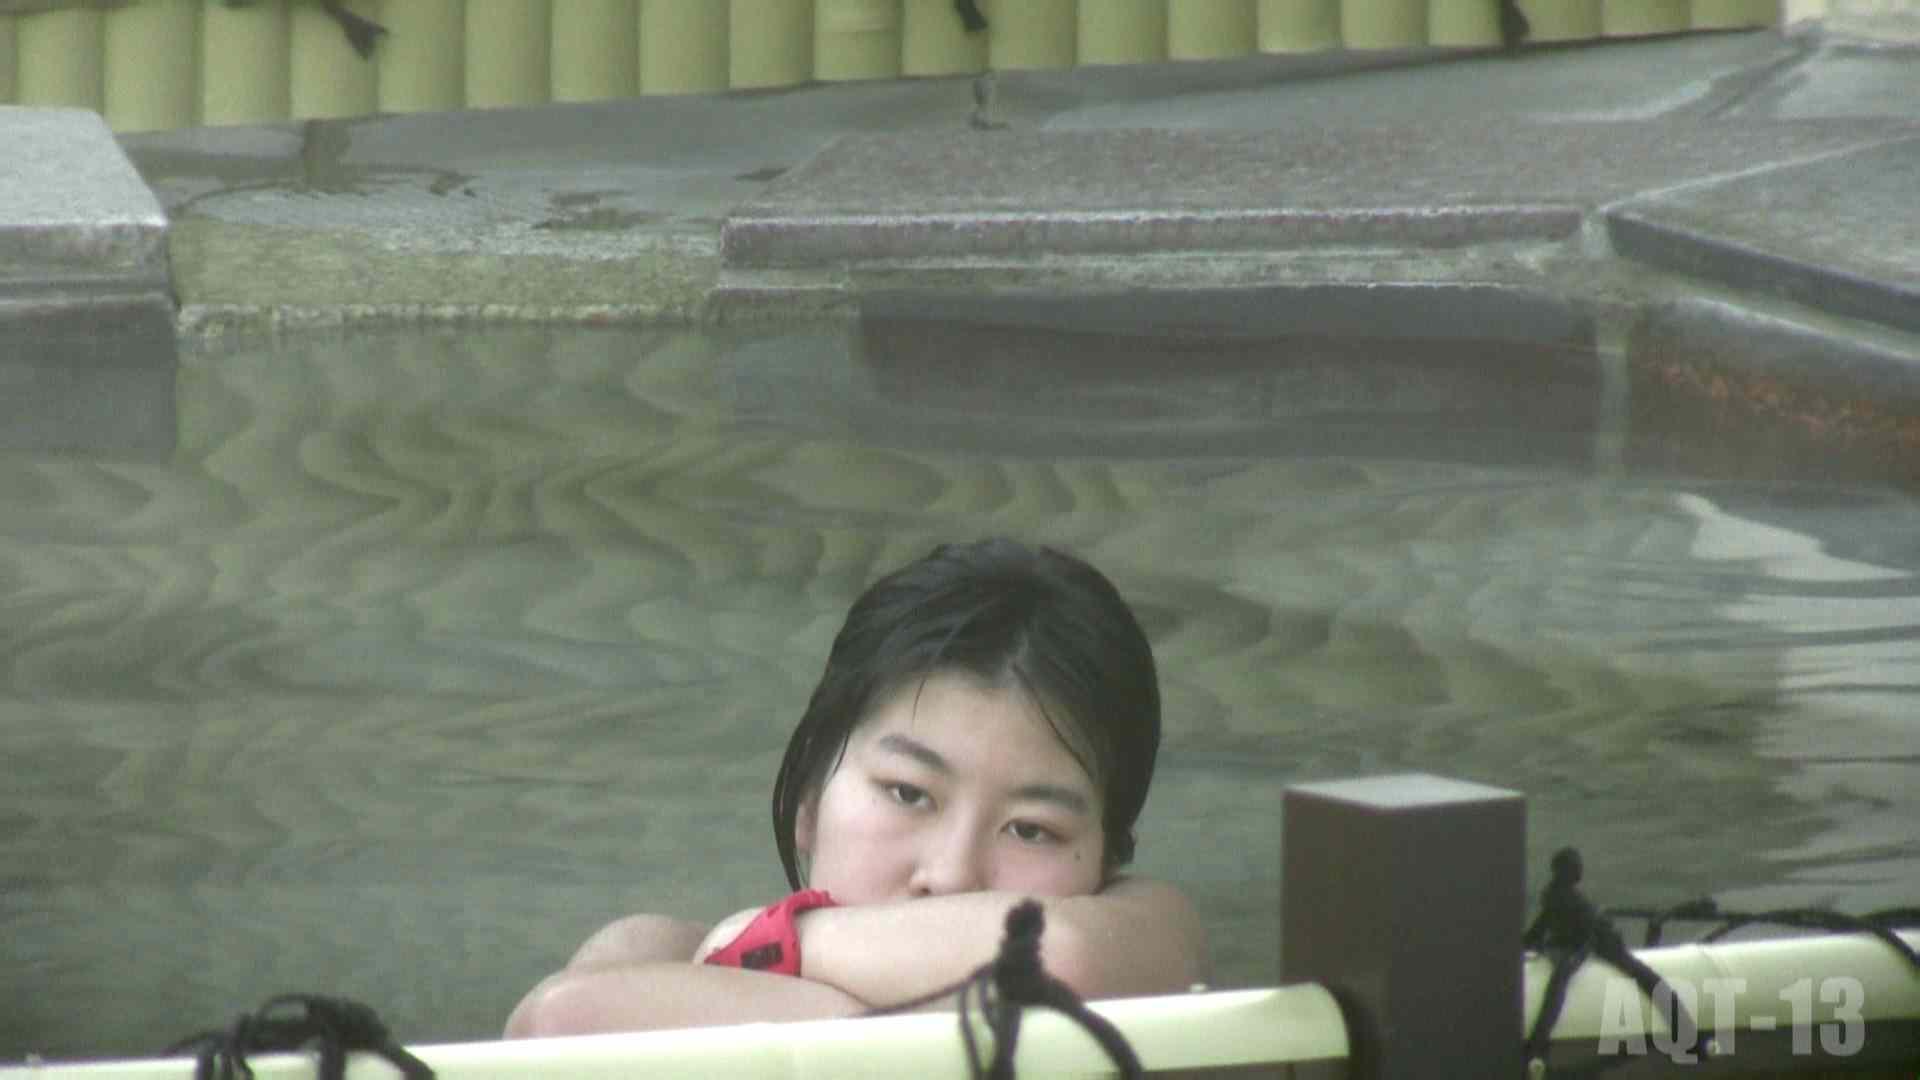 Aquaな露天風呂Vol.816 露天 AV動画キャプチャ 105PICs 62